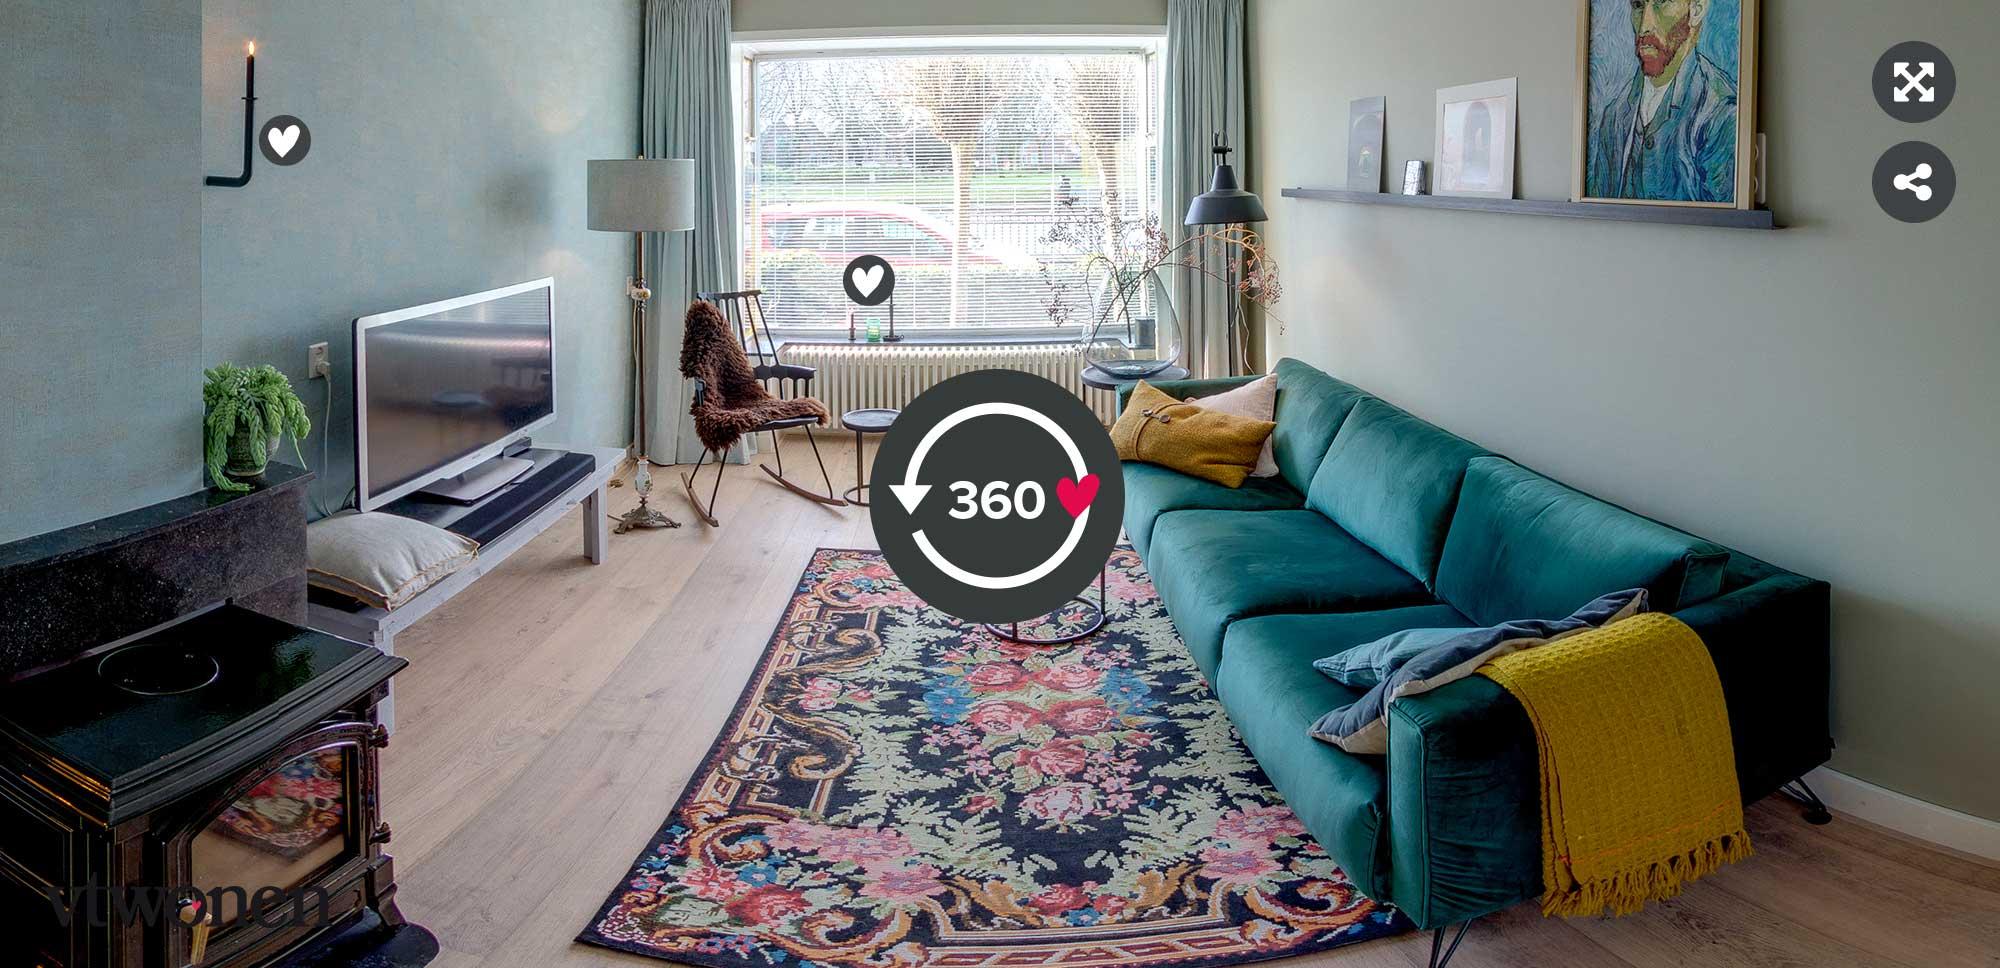 360 tour weer verliefd op je huis aflevering 3